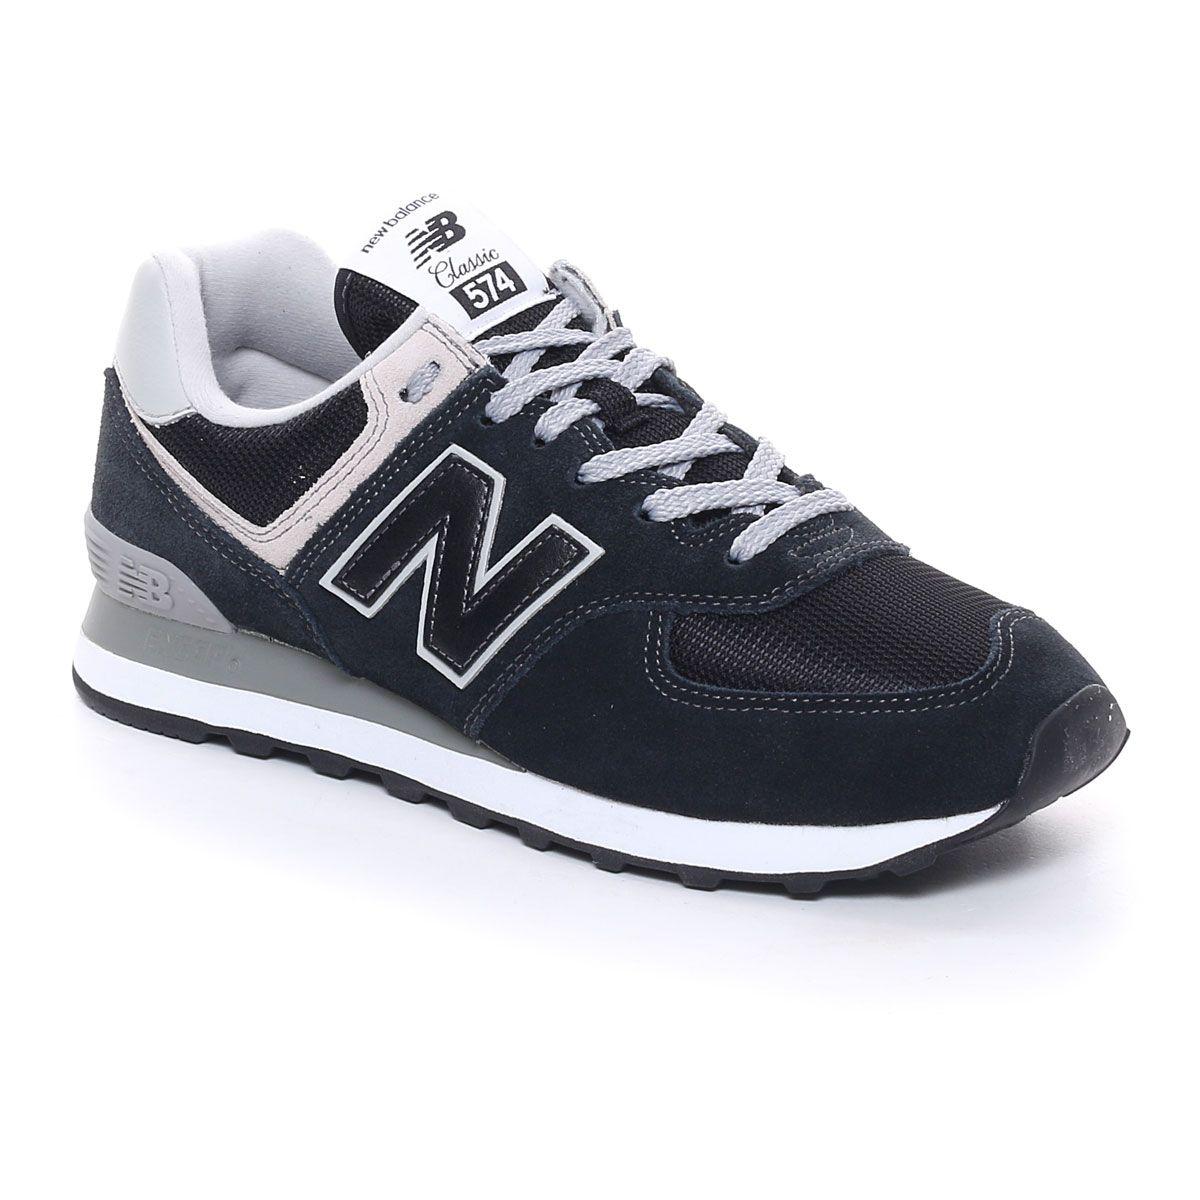 New Balance 574 Shop online - NonSoloSport